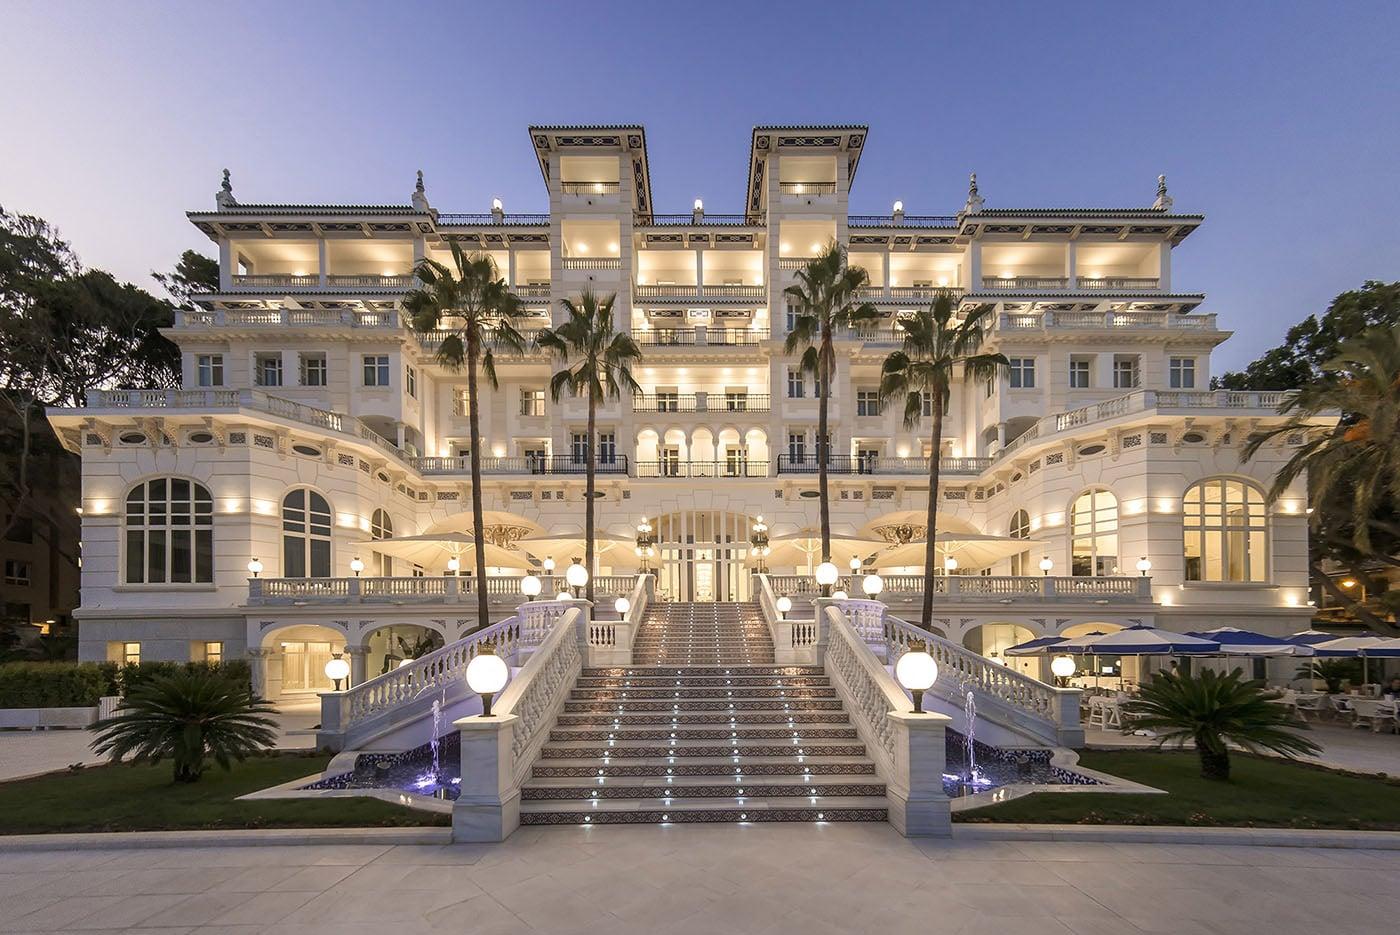 gran-hotel-miramar-adolfo-gosalvez-hoteles-panoramicos